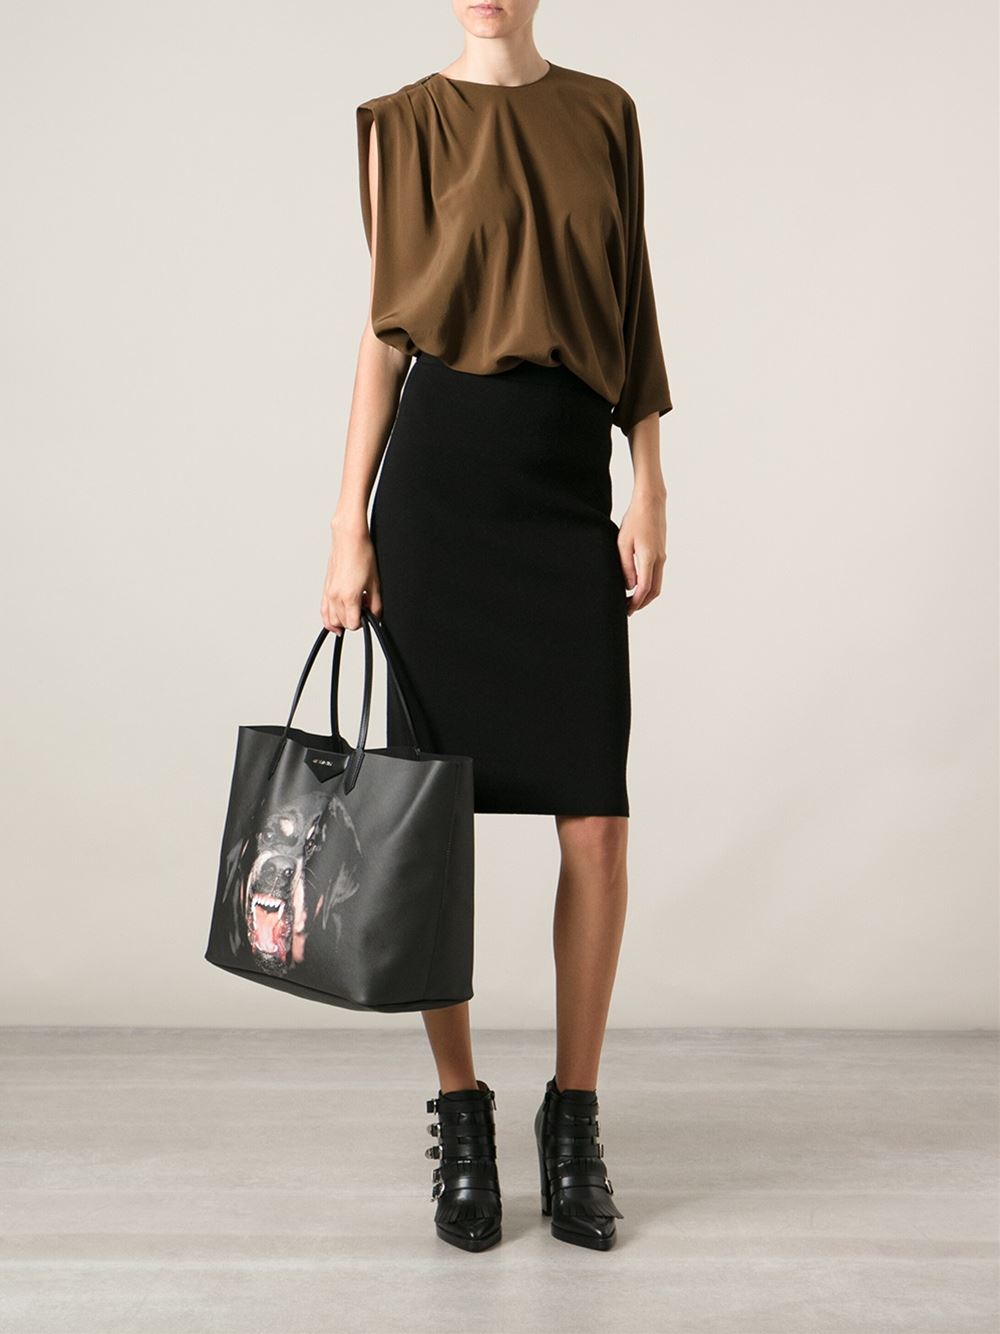 Lyst - Givenchy Large  antigona  Shopper Tote in Black 04438a64fc